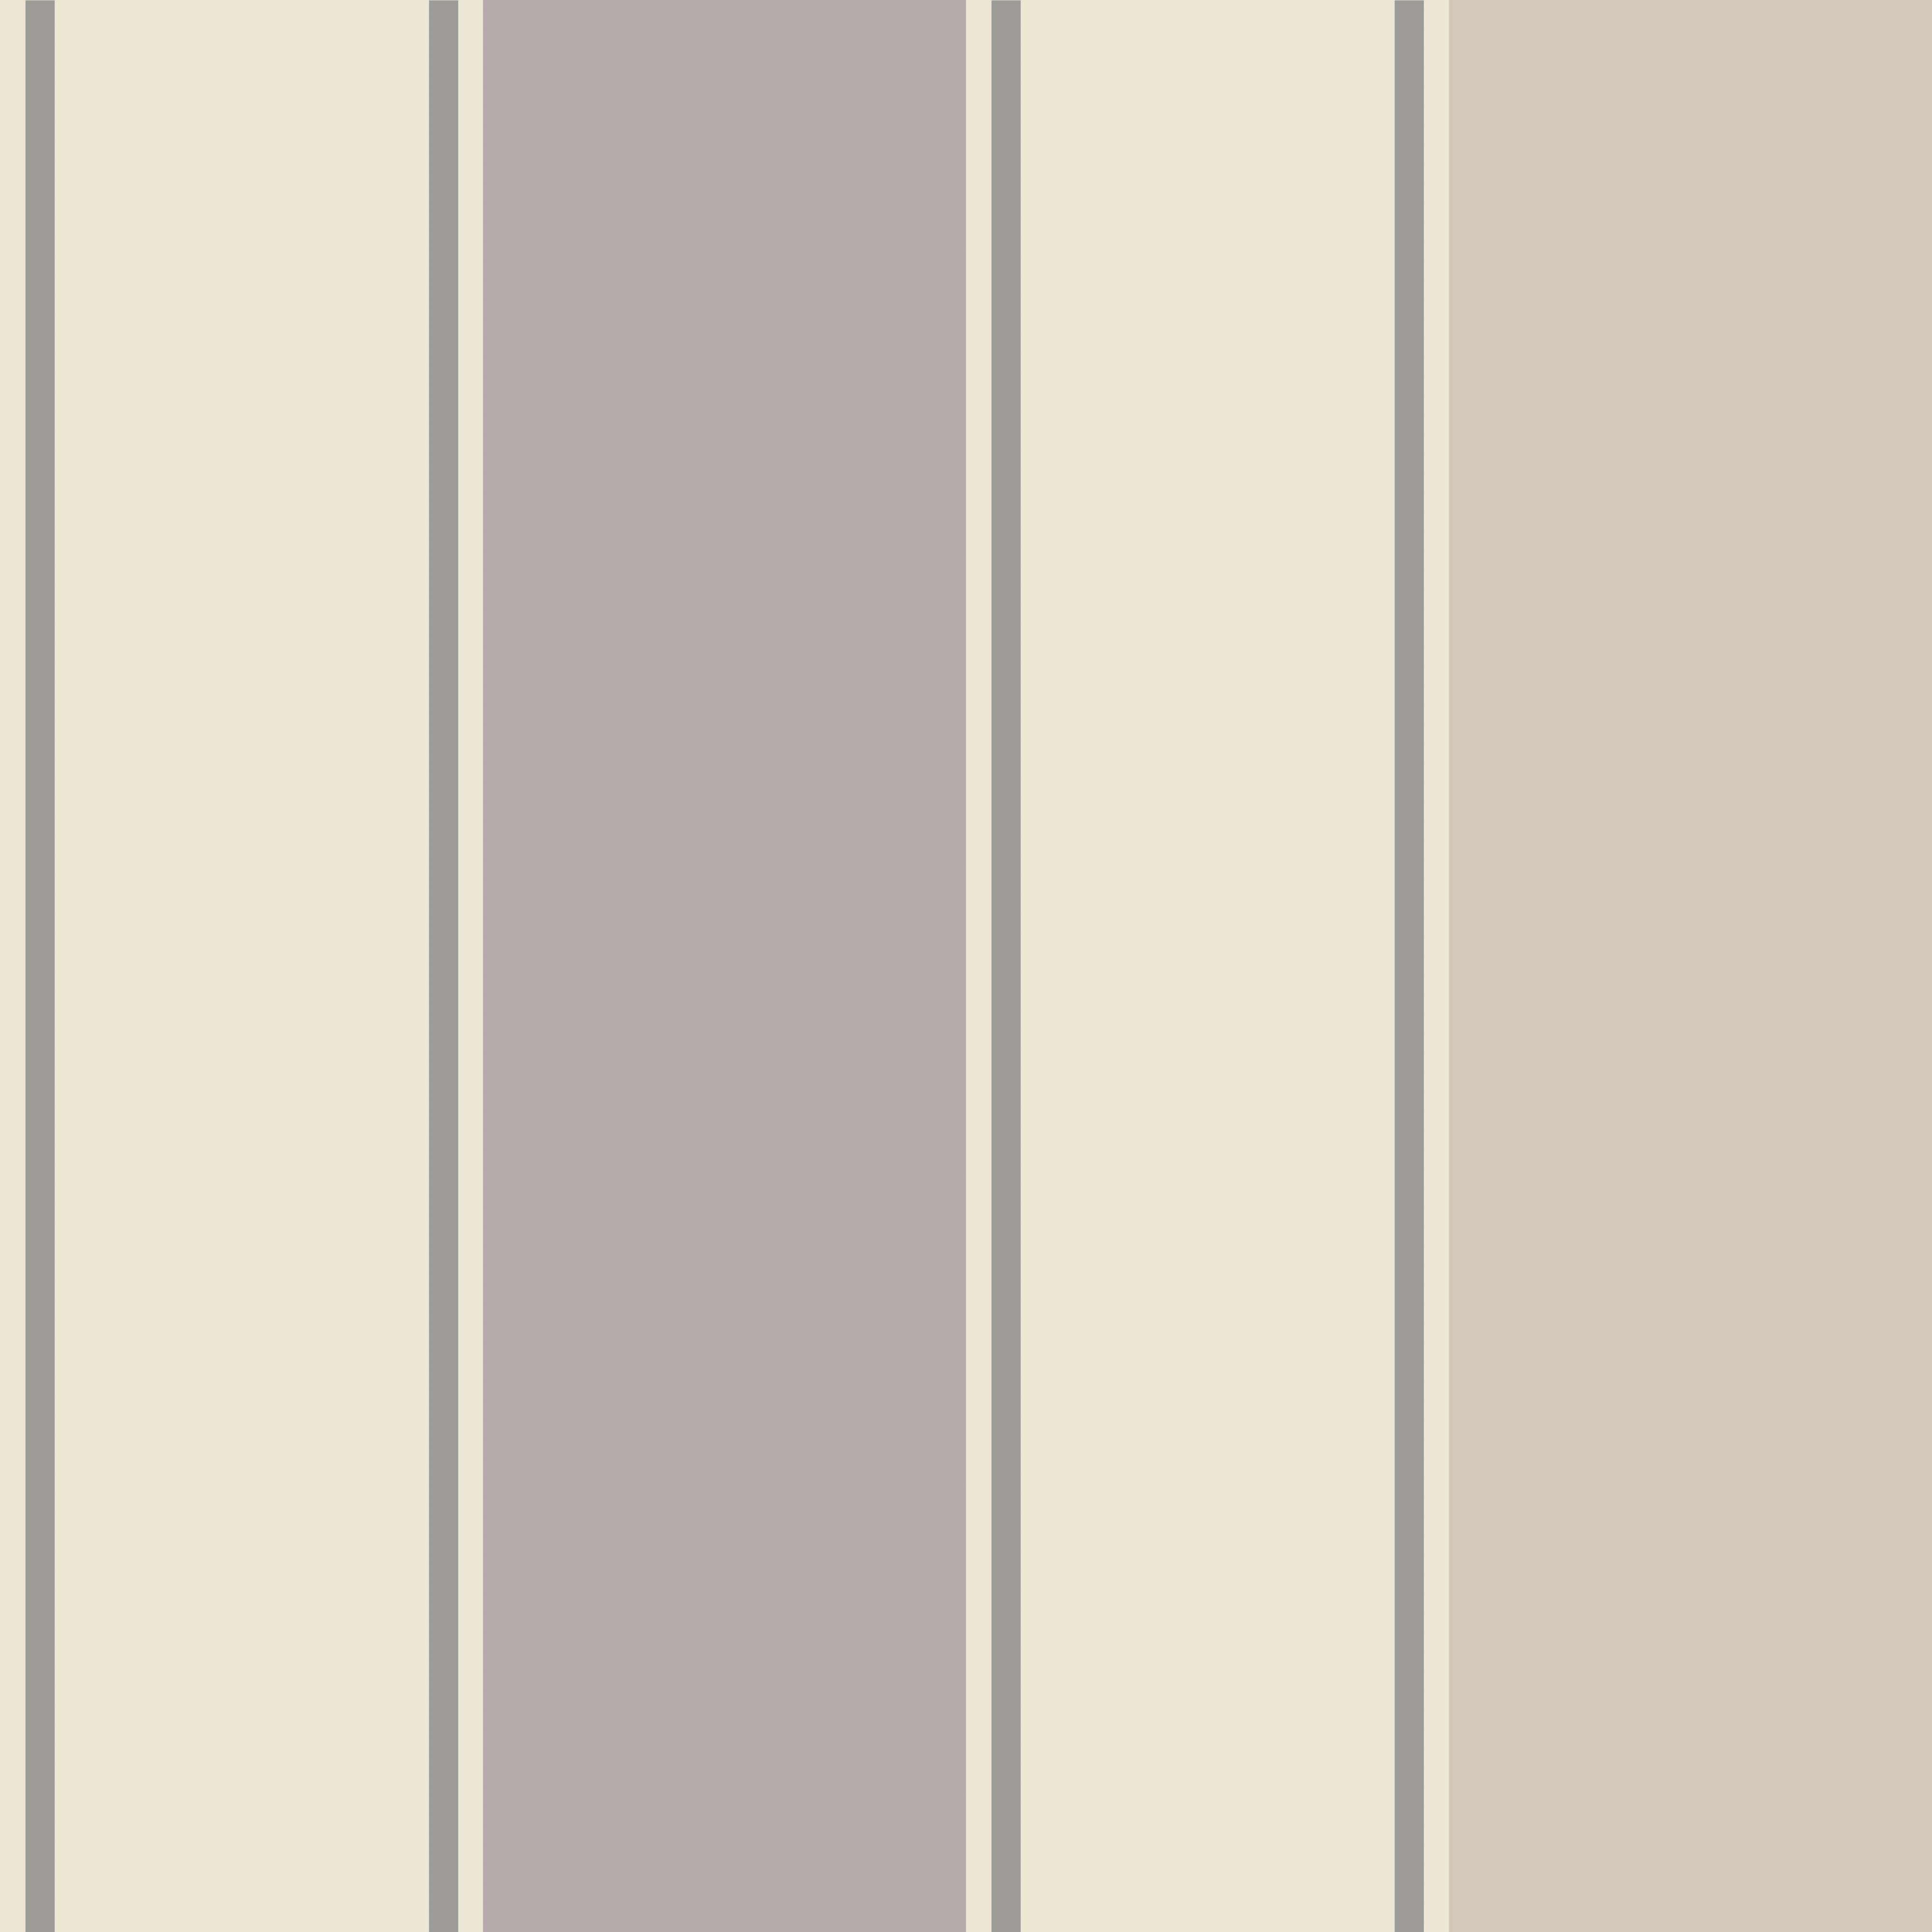 sophie conran decoris wisteria wallpaper departments diy at b q striped wallpaper diy wallpaper wallpaper sophie conran decoris wisteria wallpaper departments diy at b q striped wallpaper diy wallpaper wallpaper